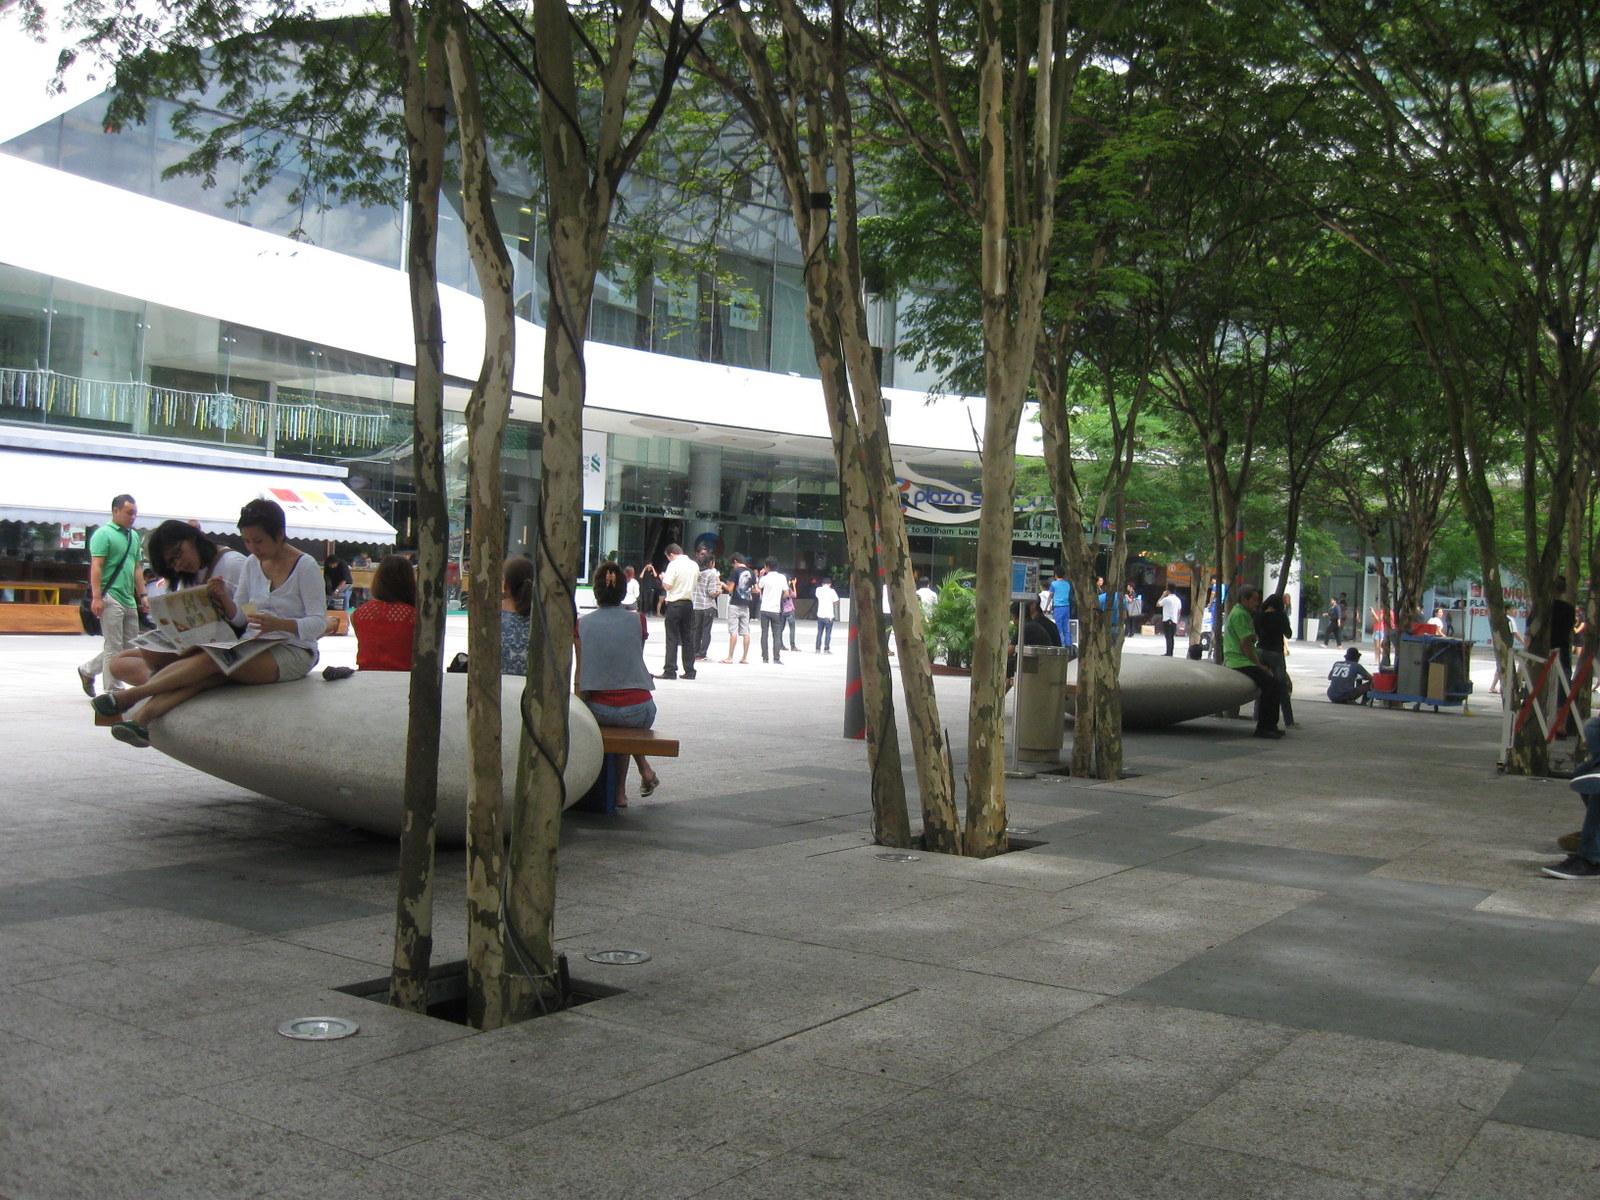 singapur plaza